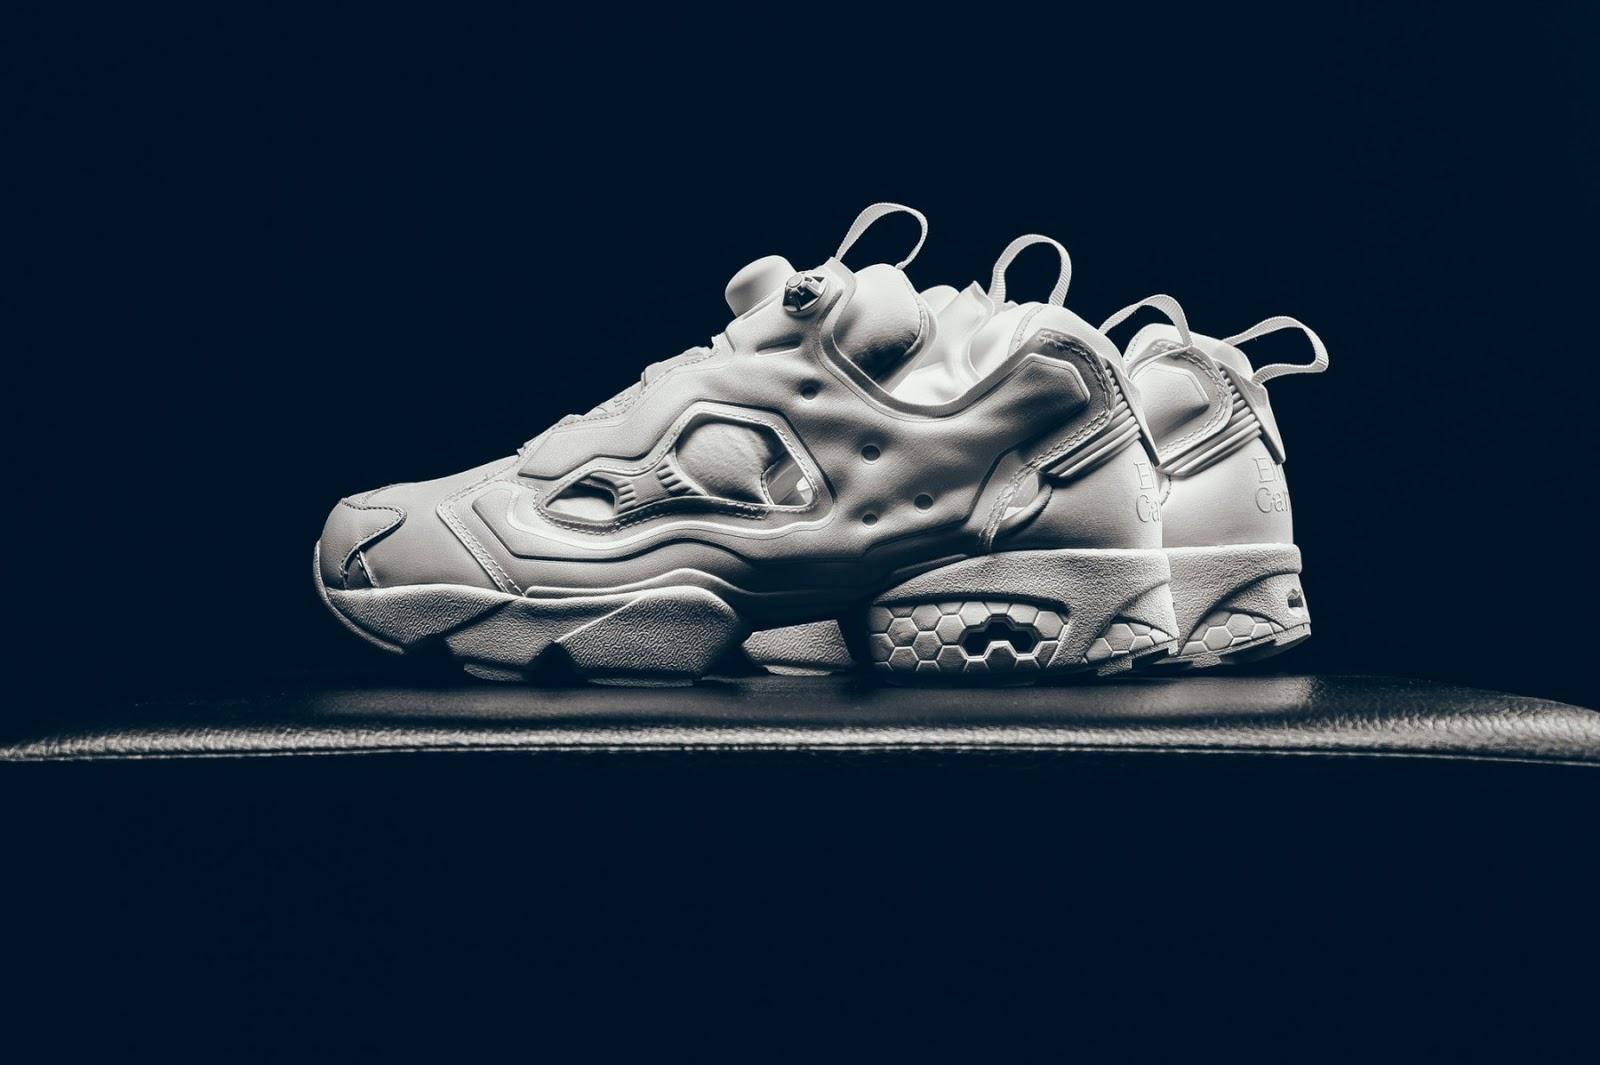 8294a3f0310c6 EffortlesslyFly.com - Online Footwear Platform for the Culture  May 2016